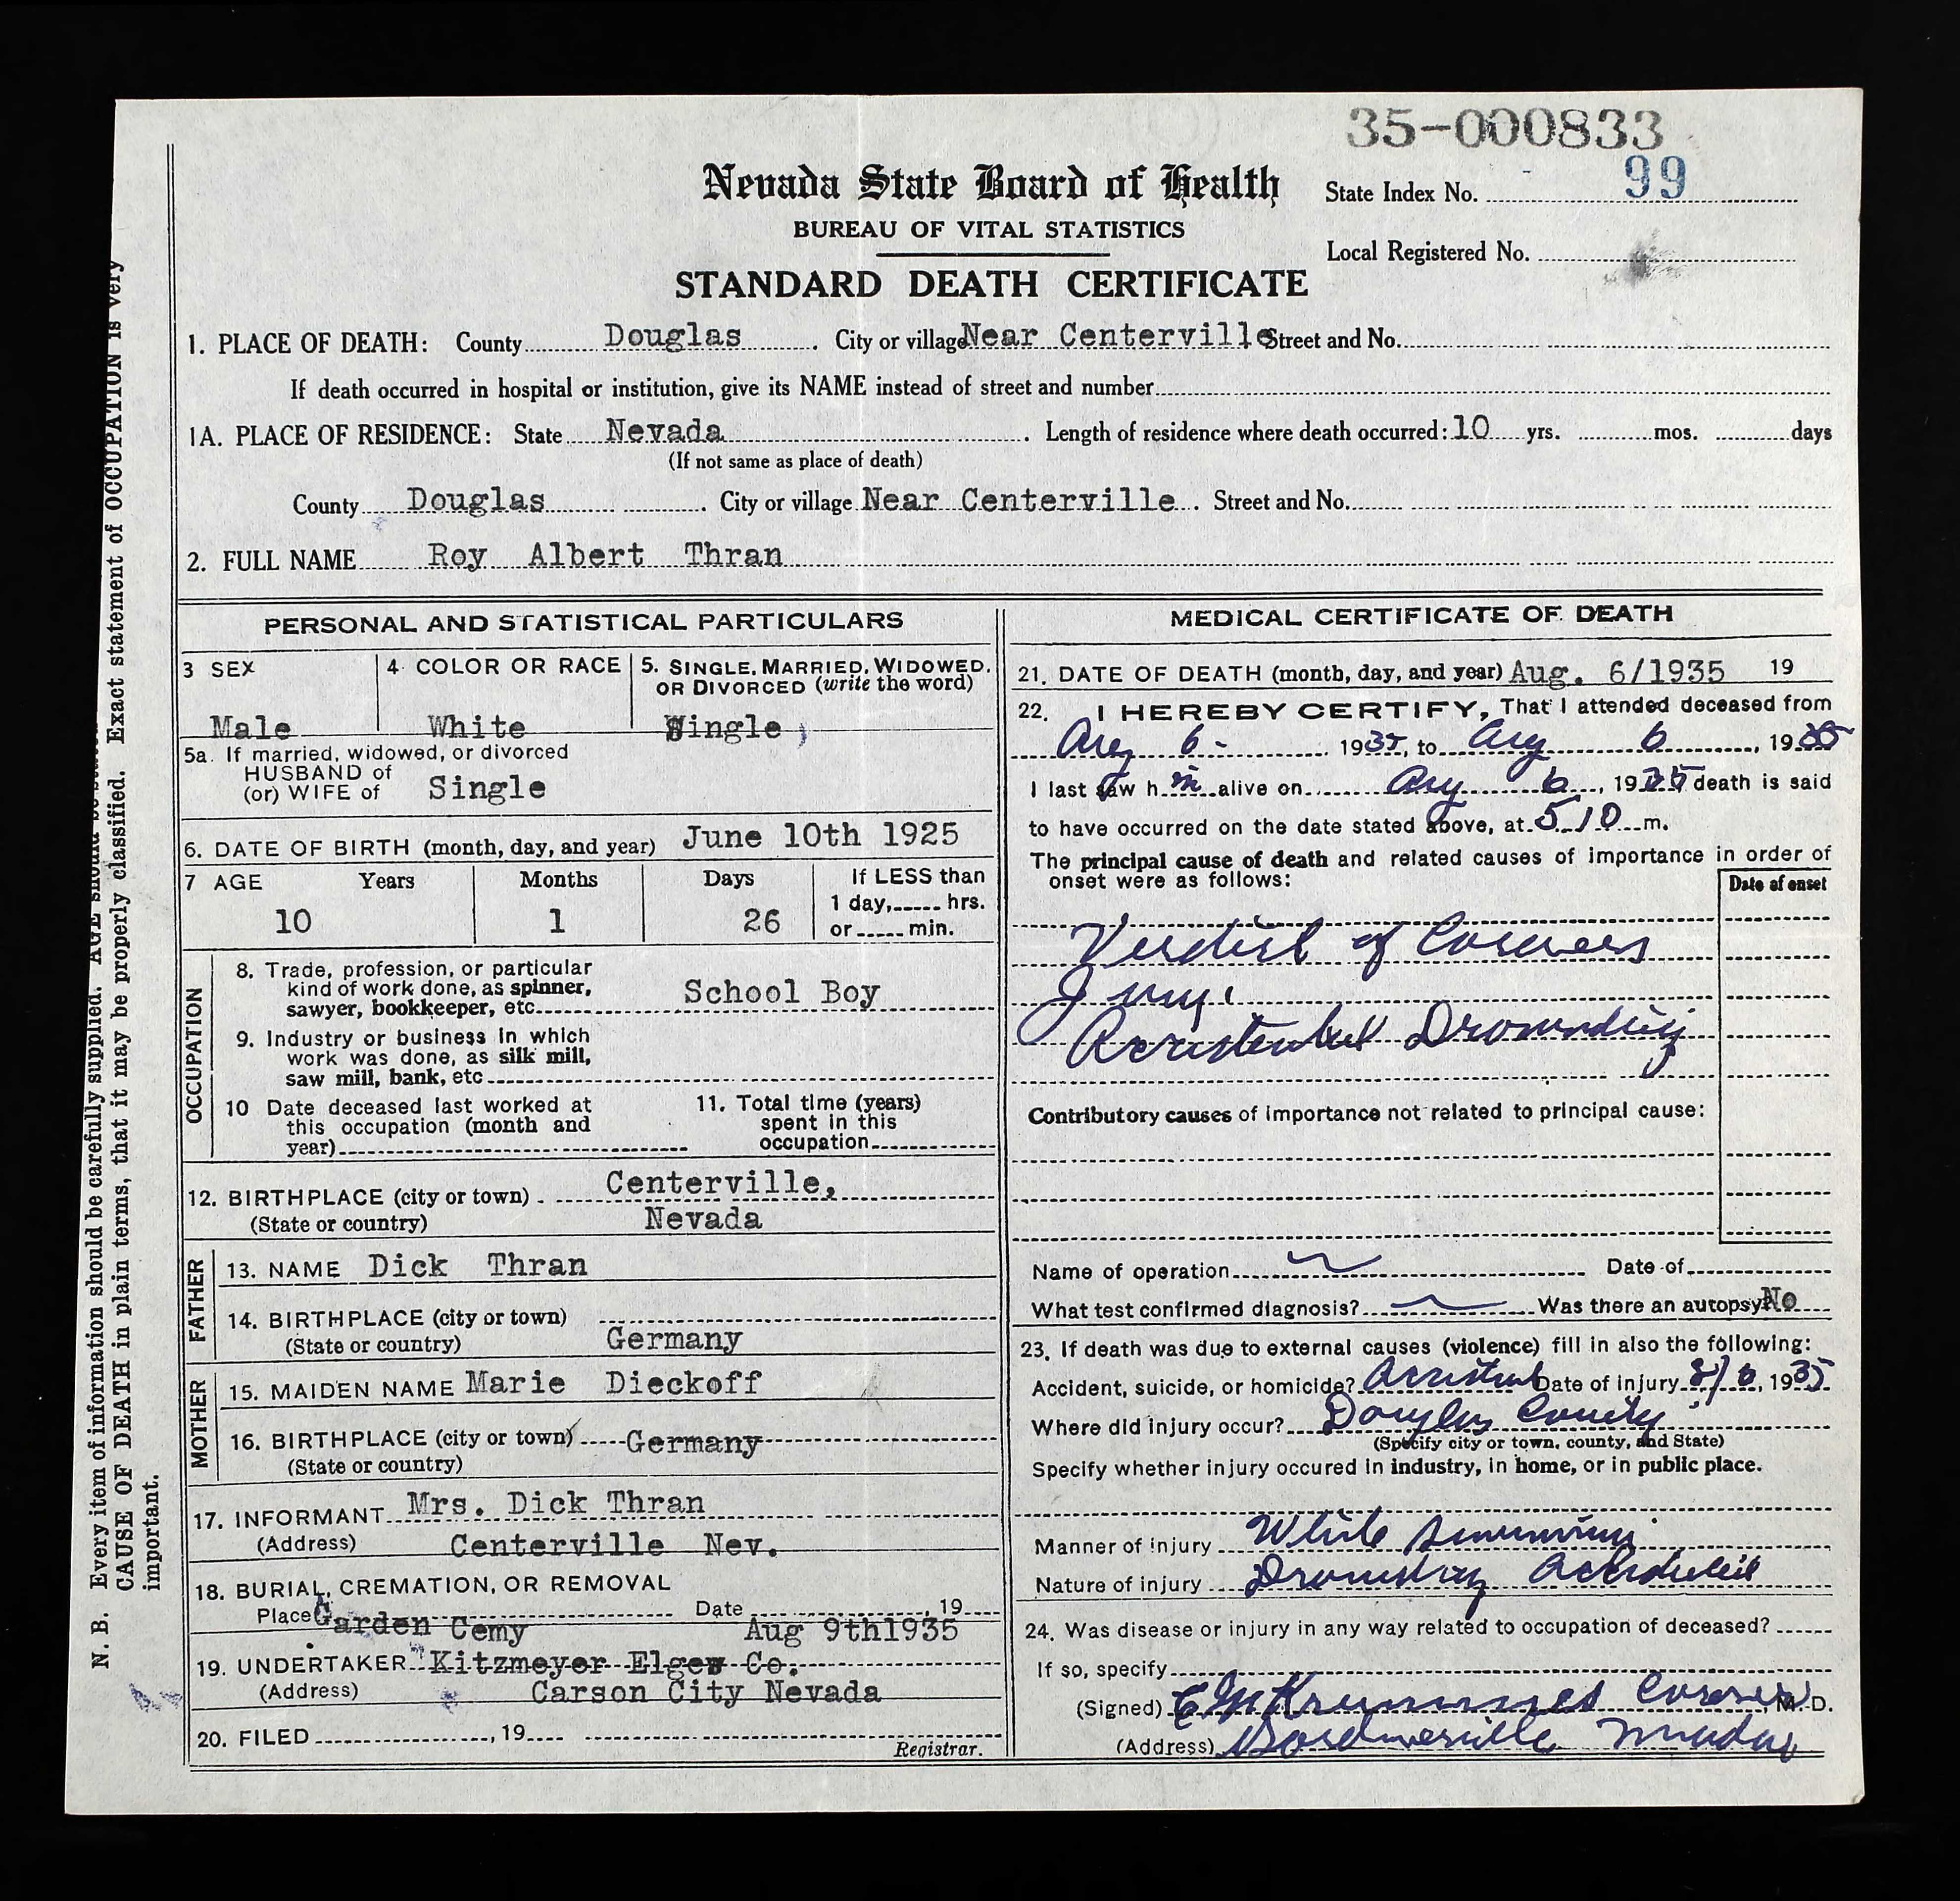 roy thran death certificate